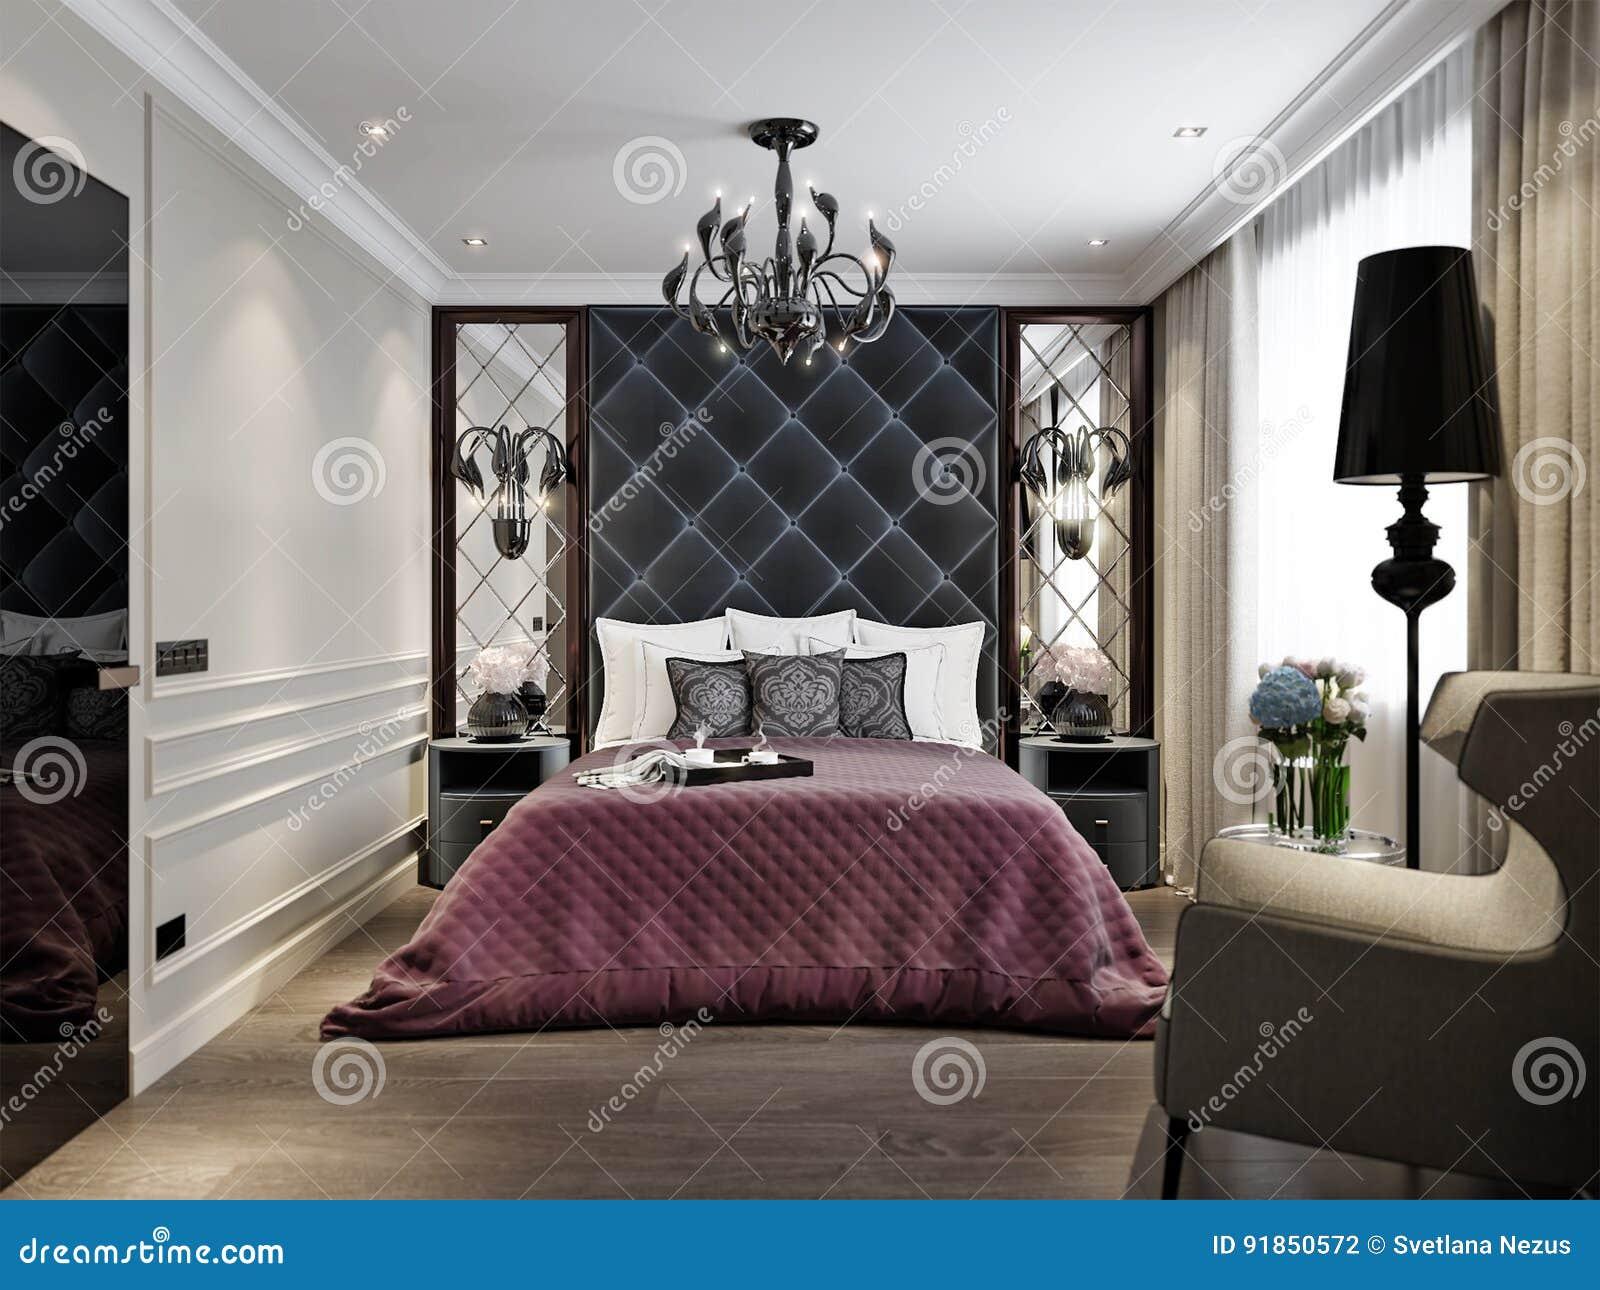 Art deco bedroom interior design classique moderne